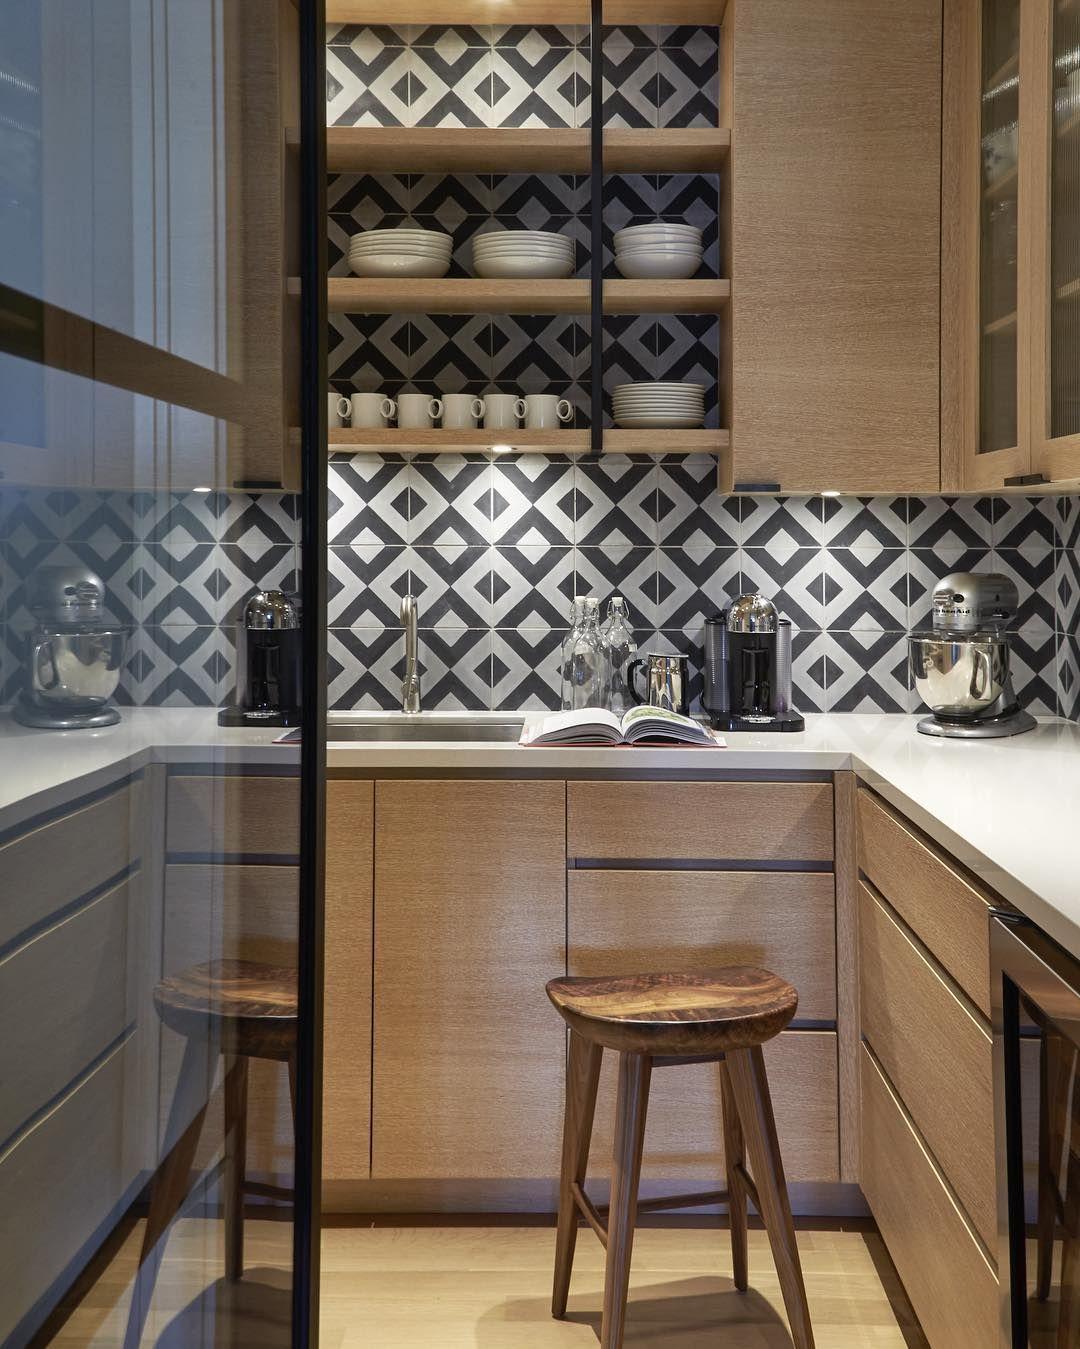 Splashback inspiration, grey and white geometric tiles - Found on ...